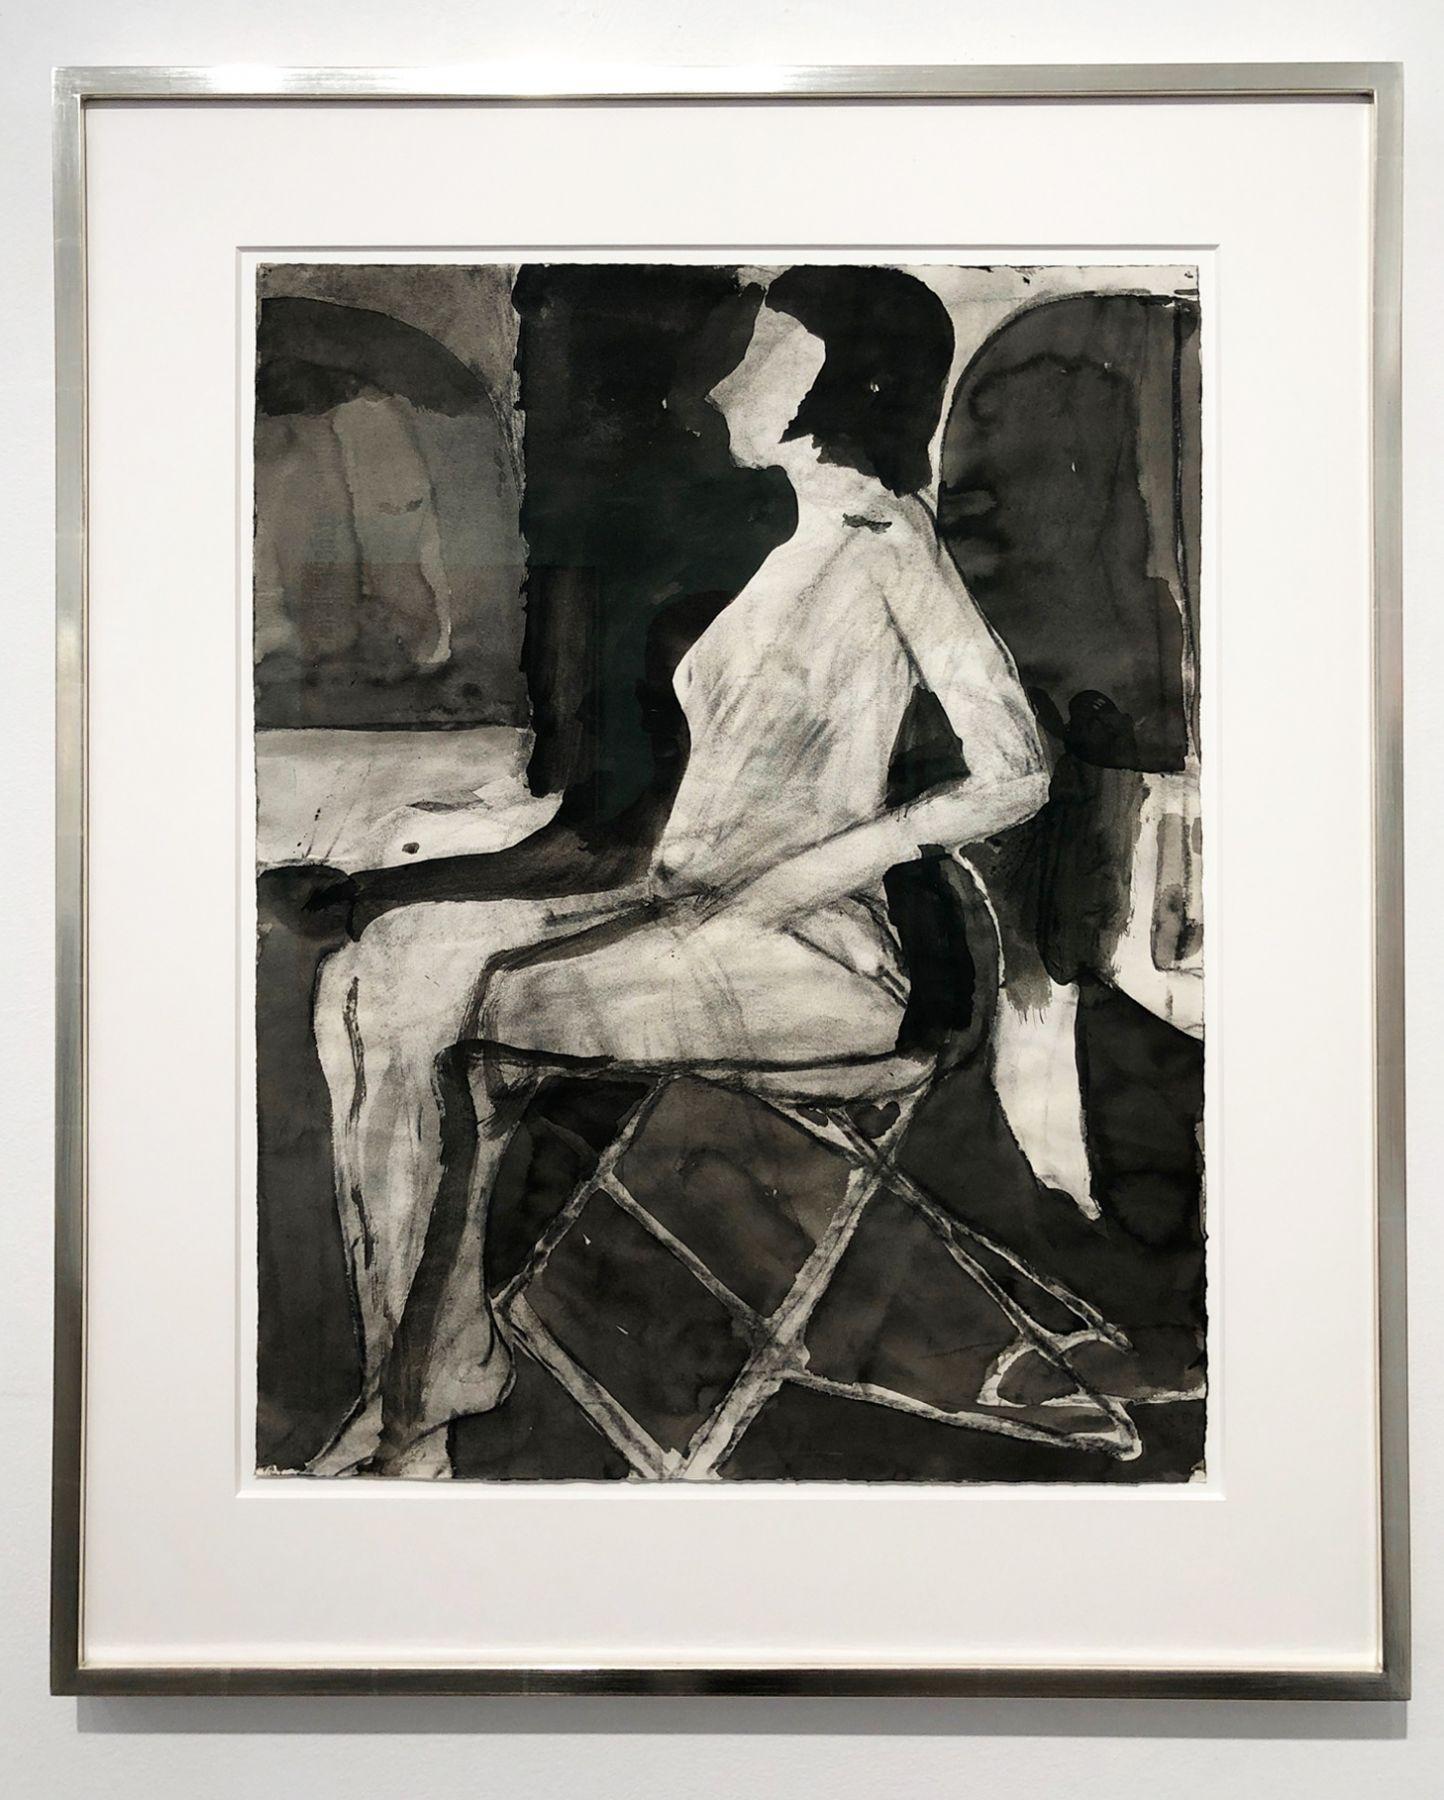 Richard Diebenkorn, Untitled (Seating Nude on Folding Chair), 1967